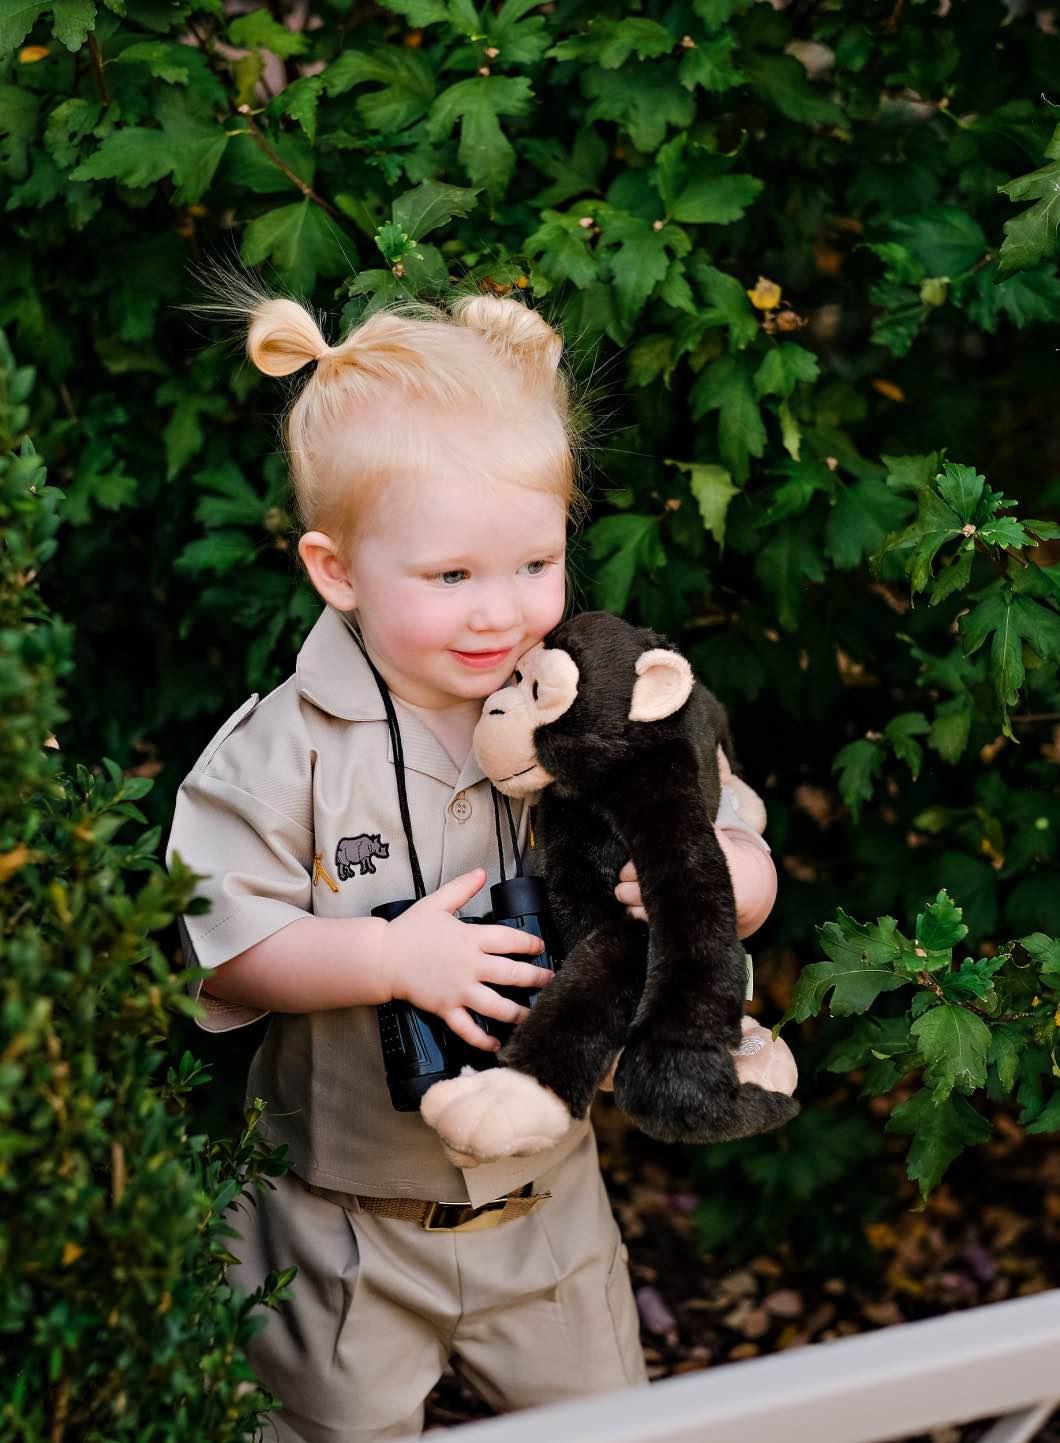 Jane Goodall - DIY Toddler Jane Goodall Costume by Atlanta mom blogger Happily Hughes by Atlanta mom blogger Happily Hughes